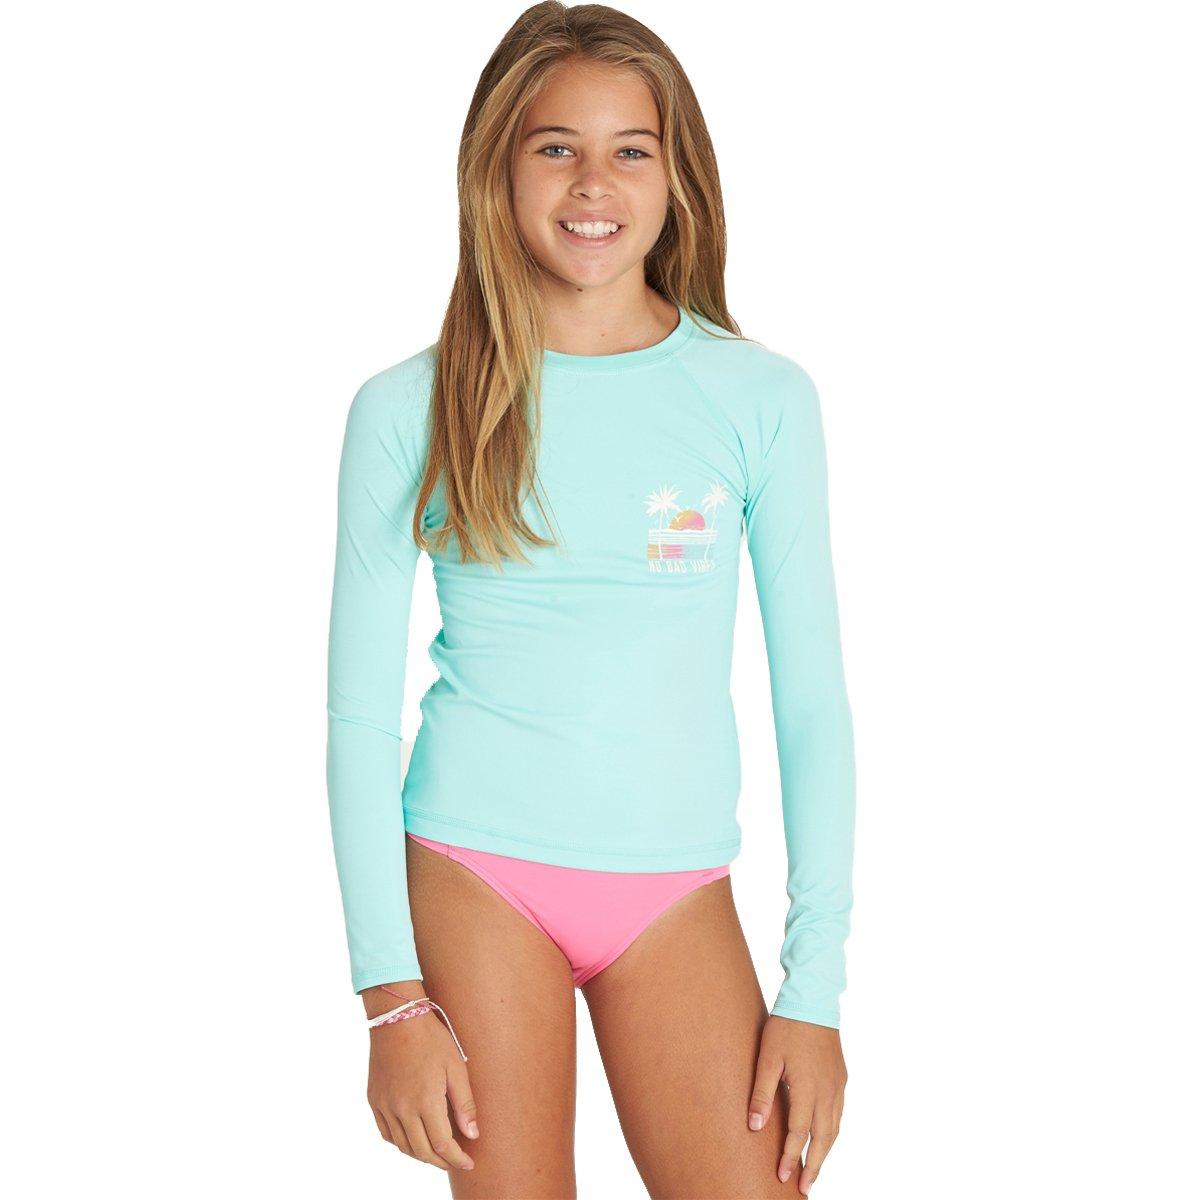 Billabong Little Girls' Sol Searcher Long Sleeve Rashguard, Beach Glass, 6X